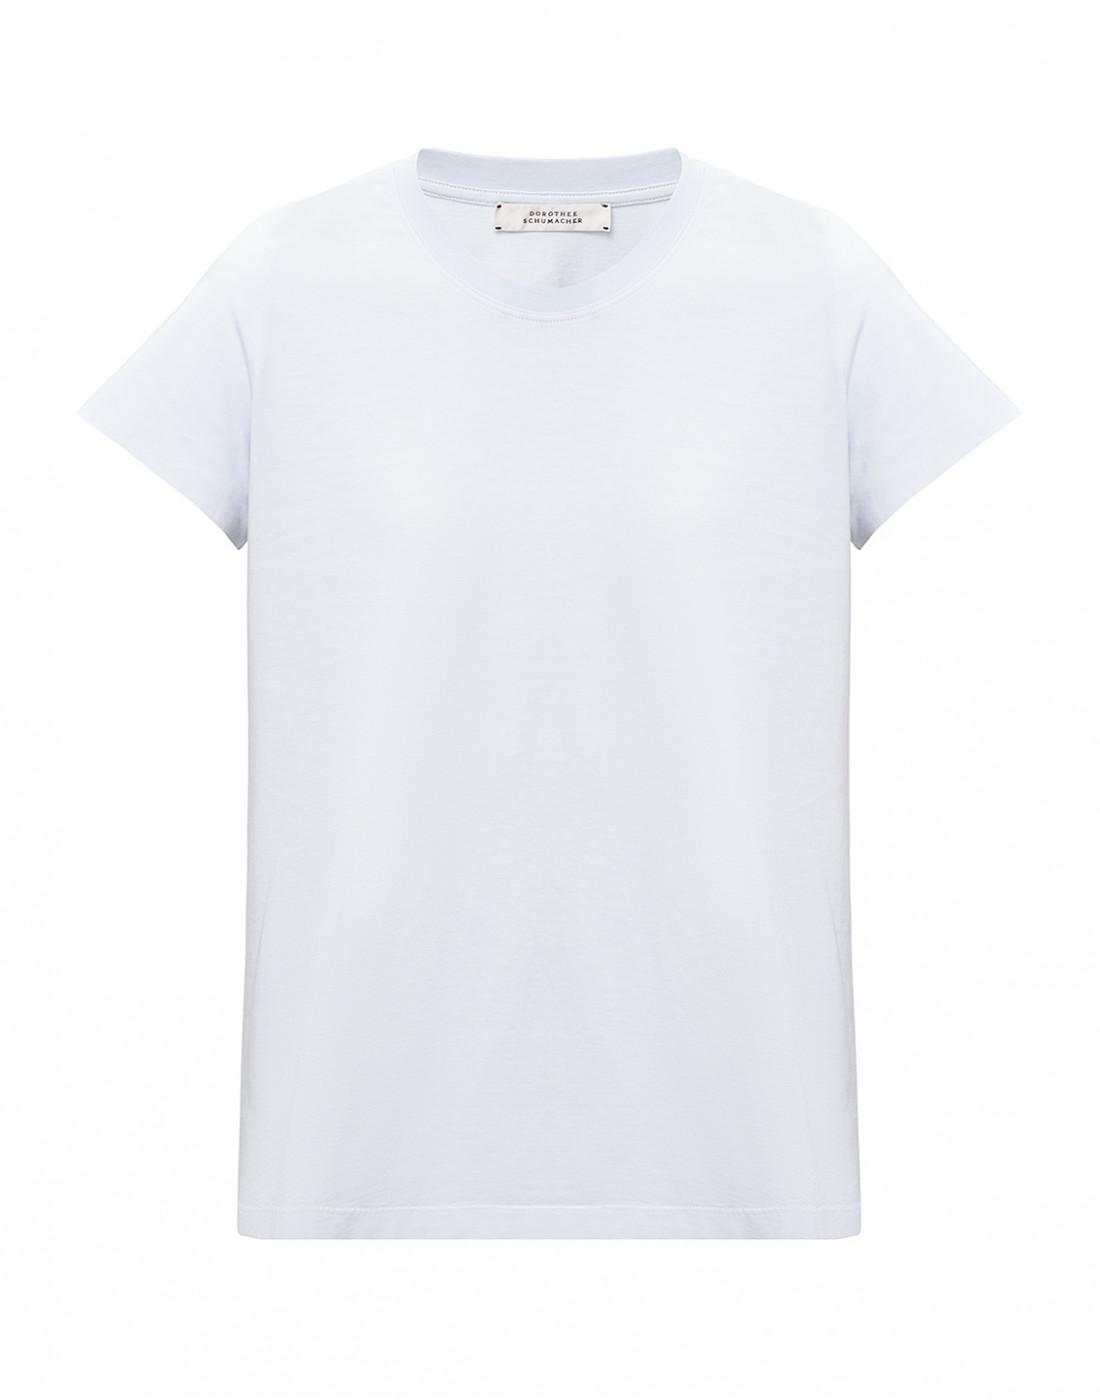 Женская голубая футболка  Dorothee Schumacher S623001/801-1